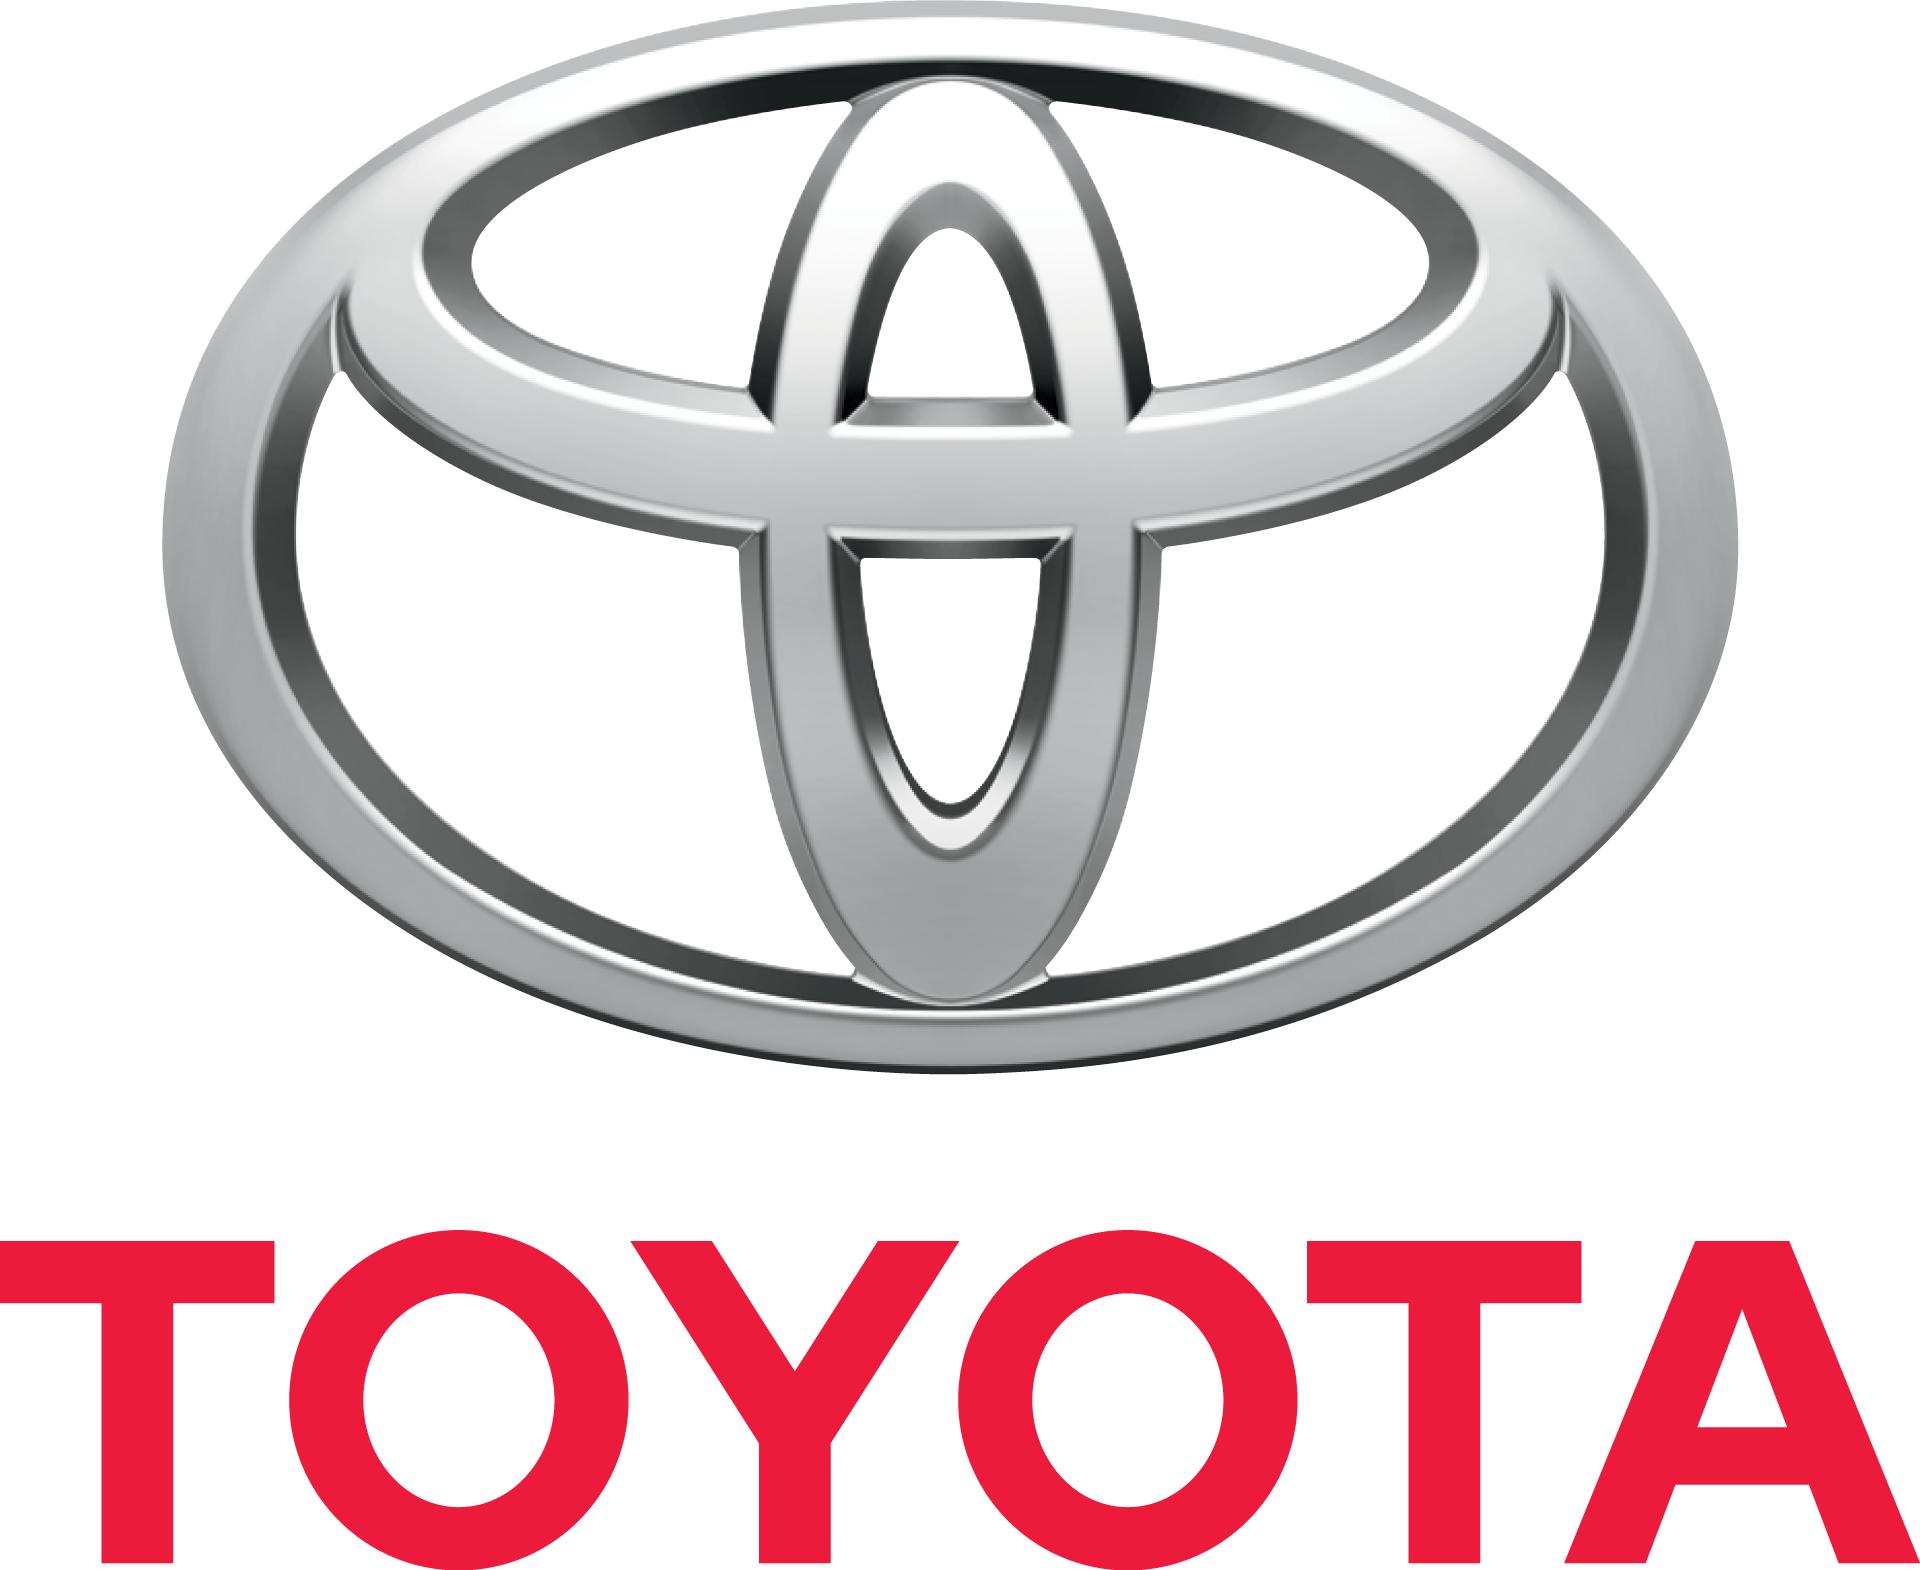 toyota logo - Google Search | car brands | Toyota symbol ...